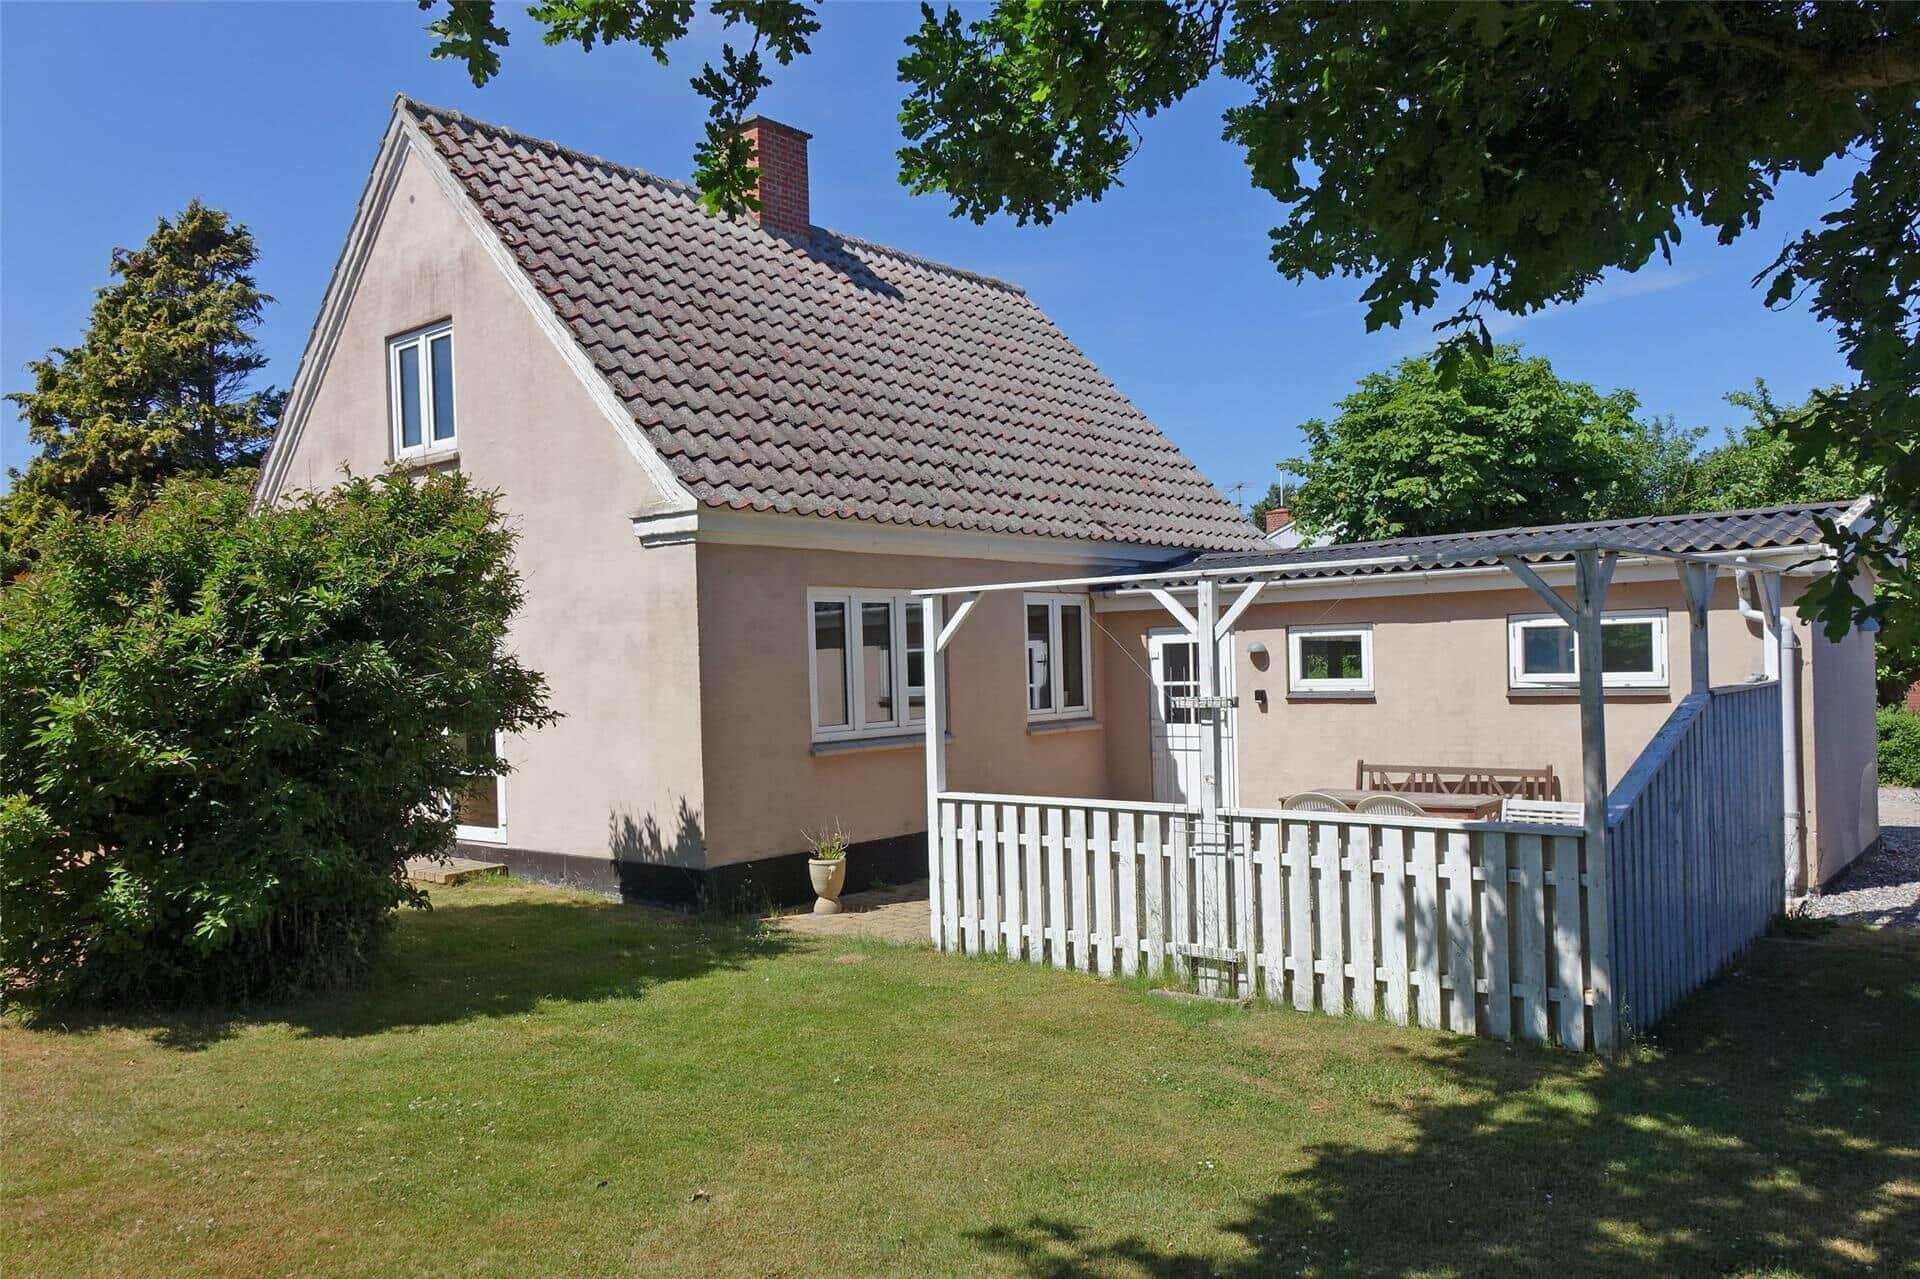 Billede 1-170 Sommerhus 20402, Mågevej 6, DK - 8305 Samsø